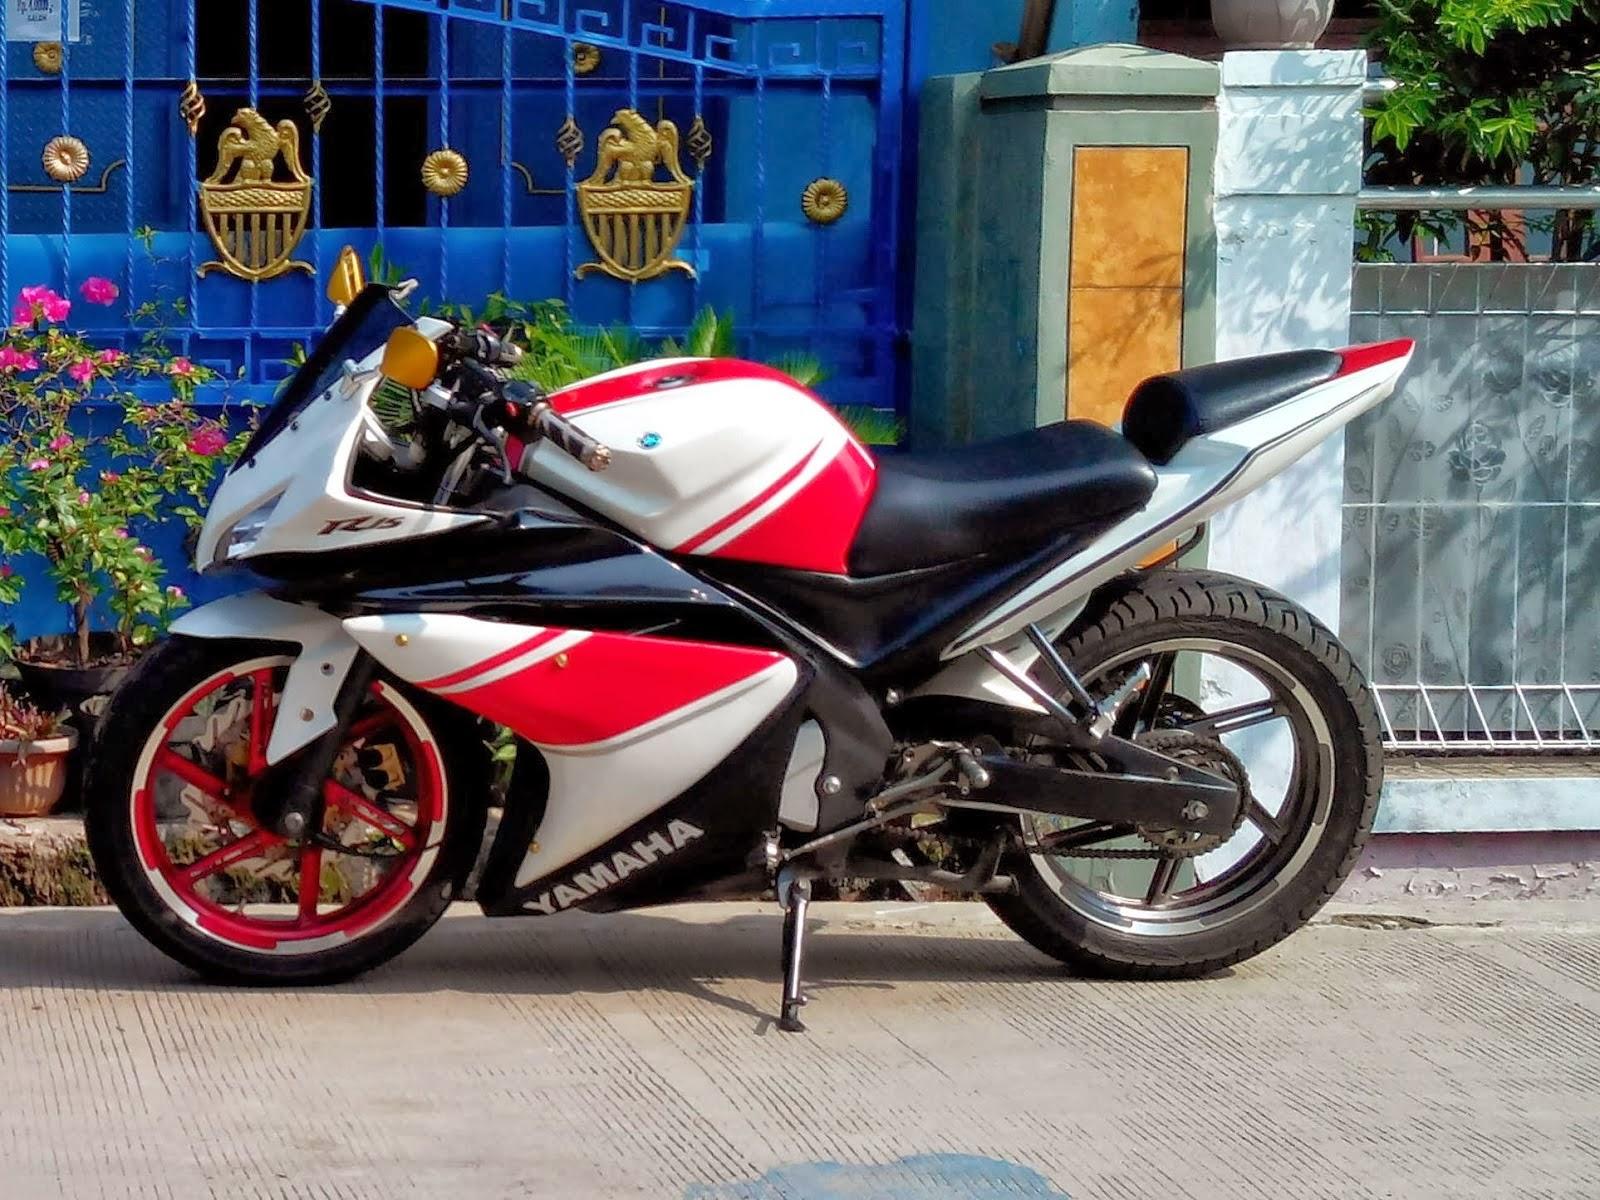 Kabar Motogp Terbaru 2013 Berita Otomotif Terbaru Dalam Dan Luar Negeri Modif Warna Yamaha New Vixion Modifikasi Motor Yamaha 2016